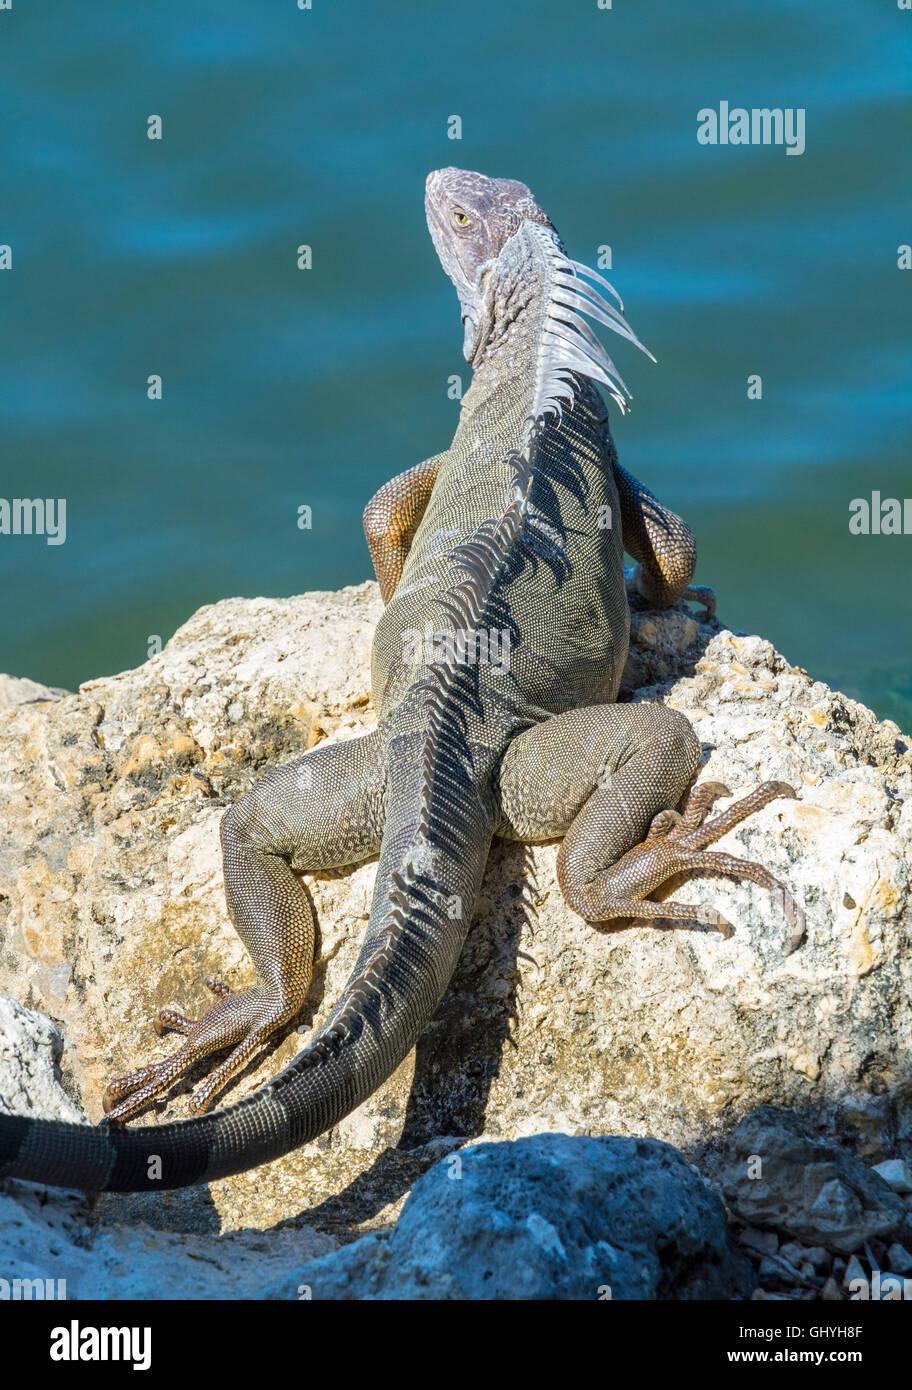 Florida Keys, Grassy Key, Dolphin Research Center, commun Iguane vert (Iguana iguana) Banque D'Images